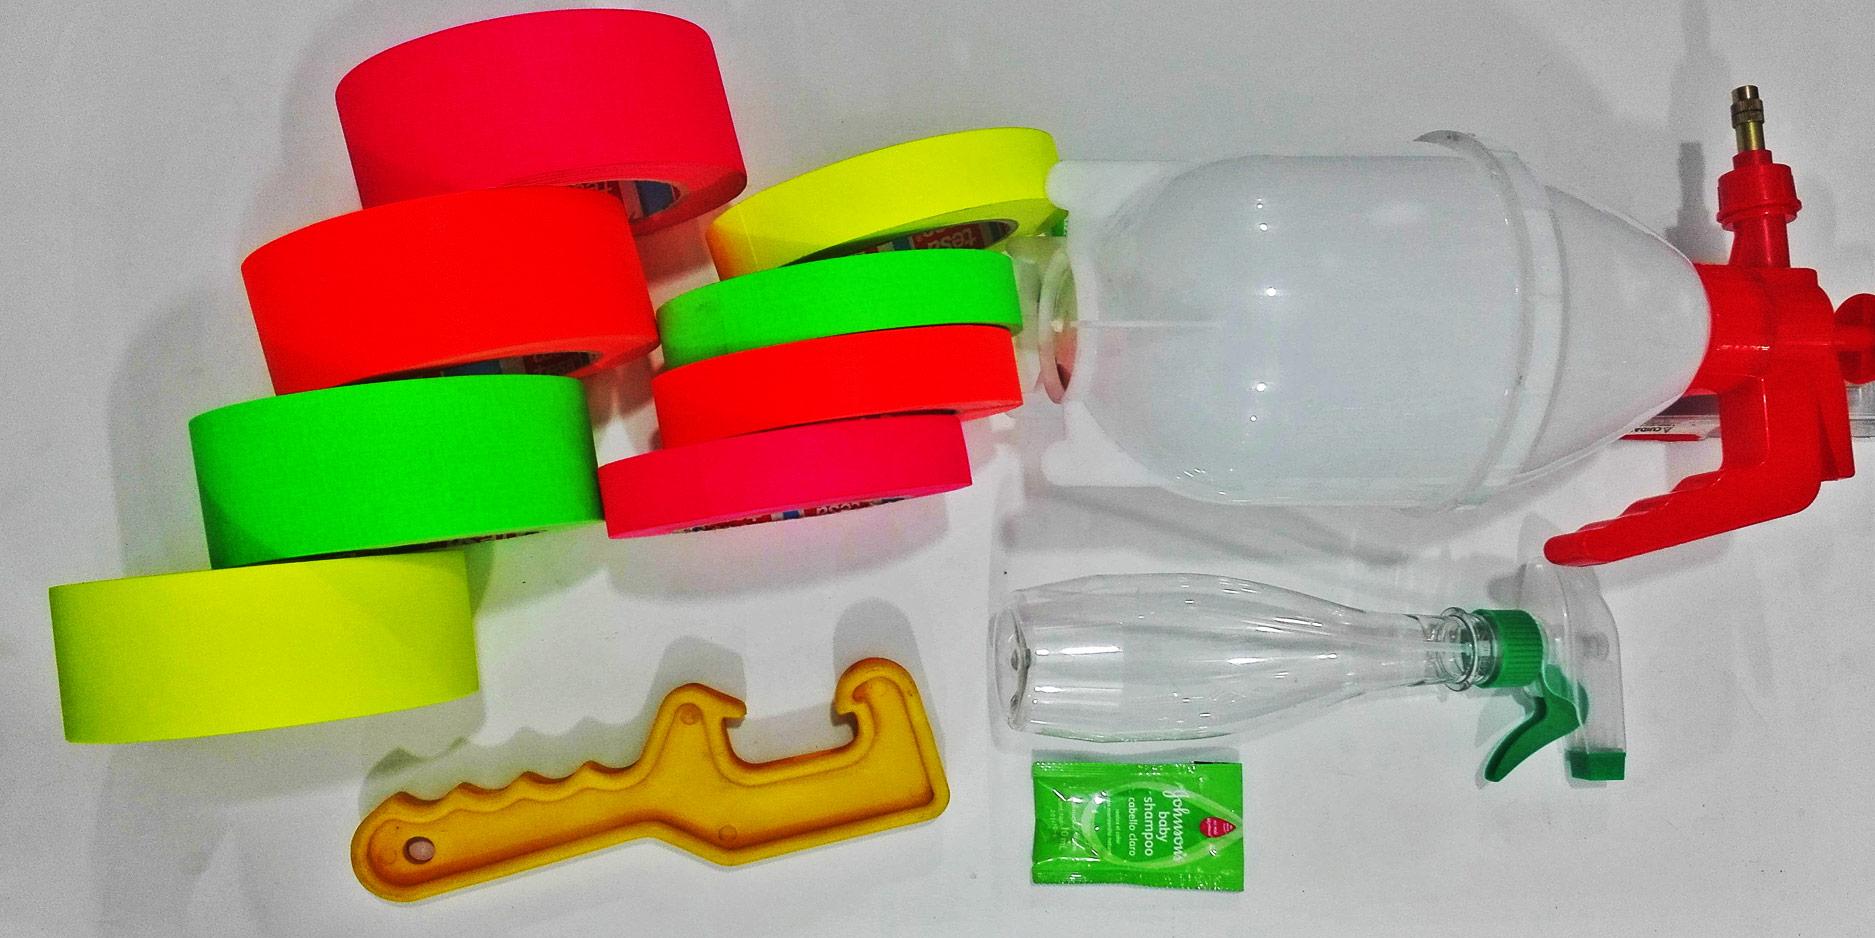 cinta-gafer-y-atomizadores-web